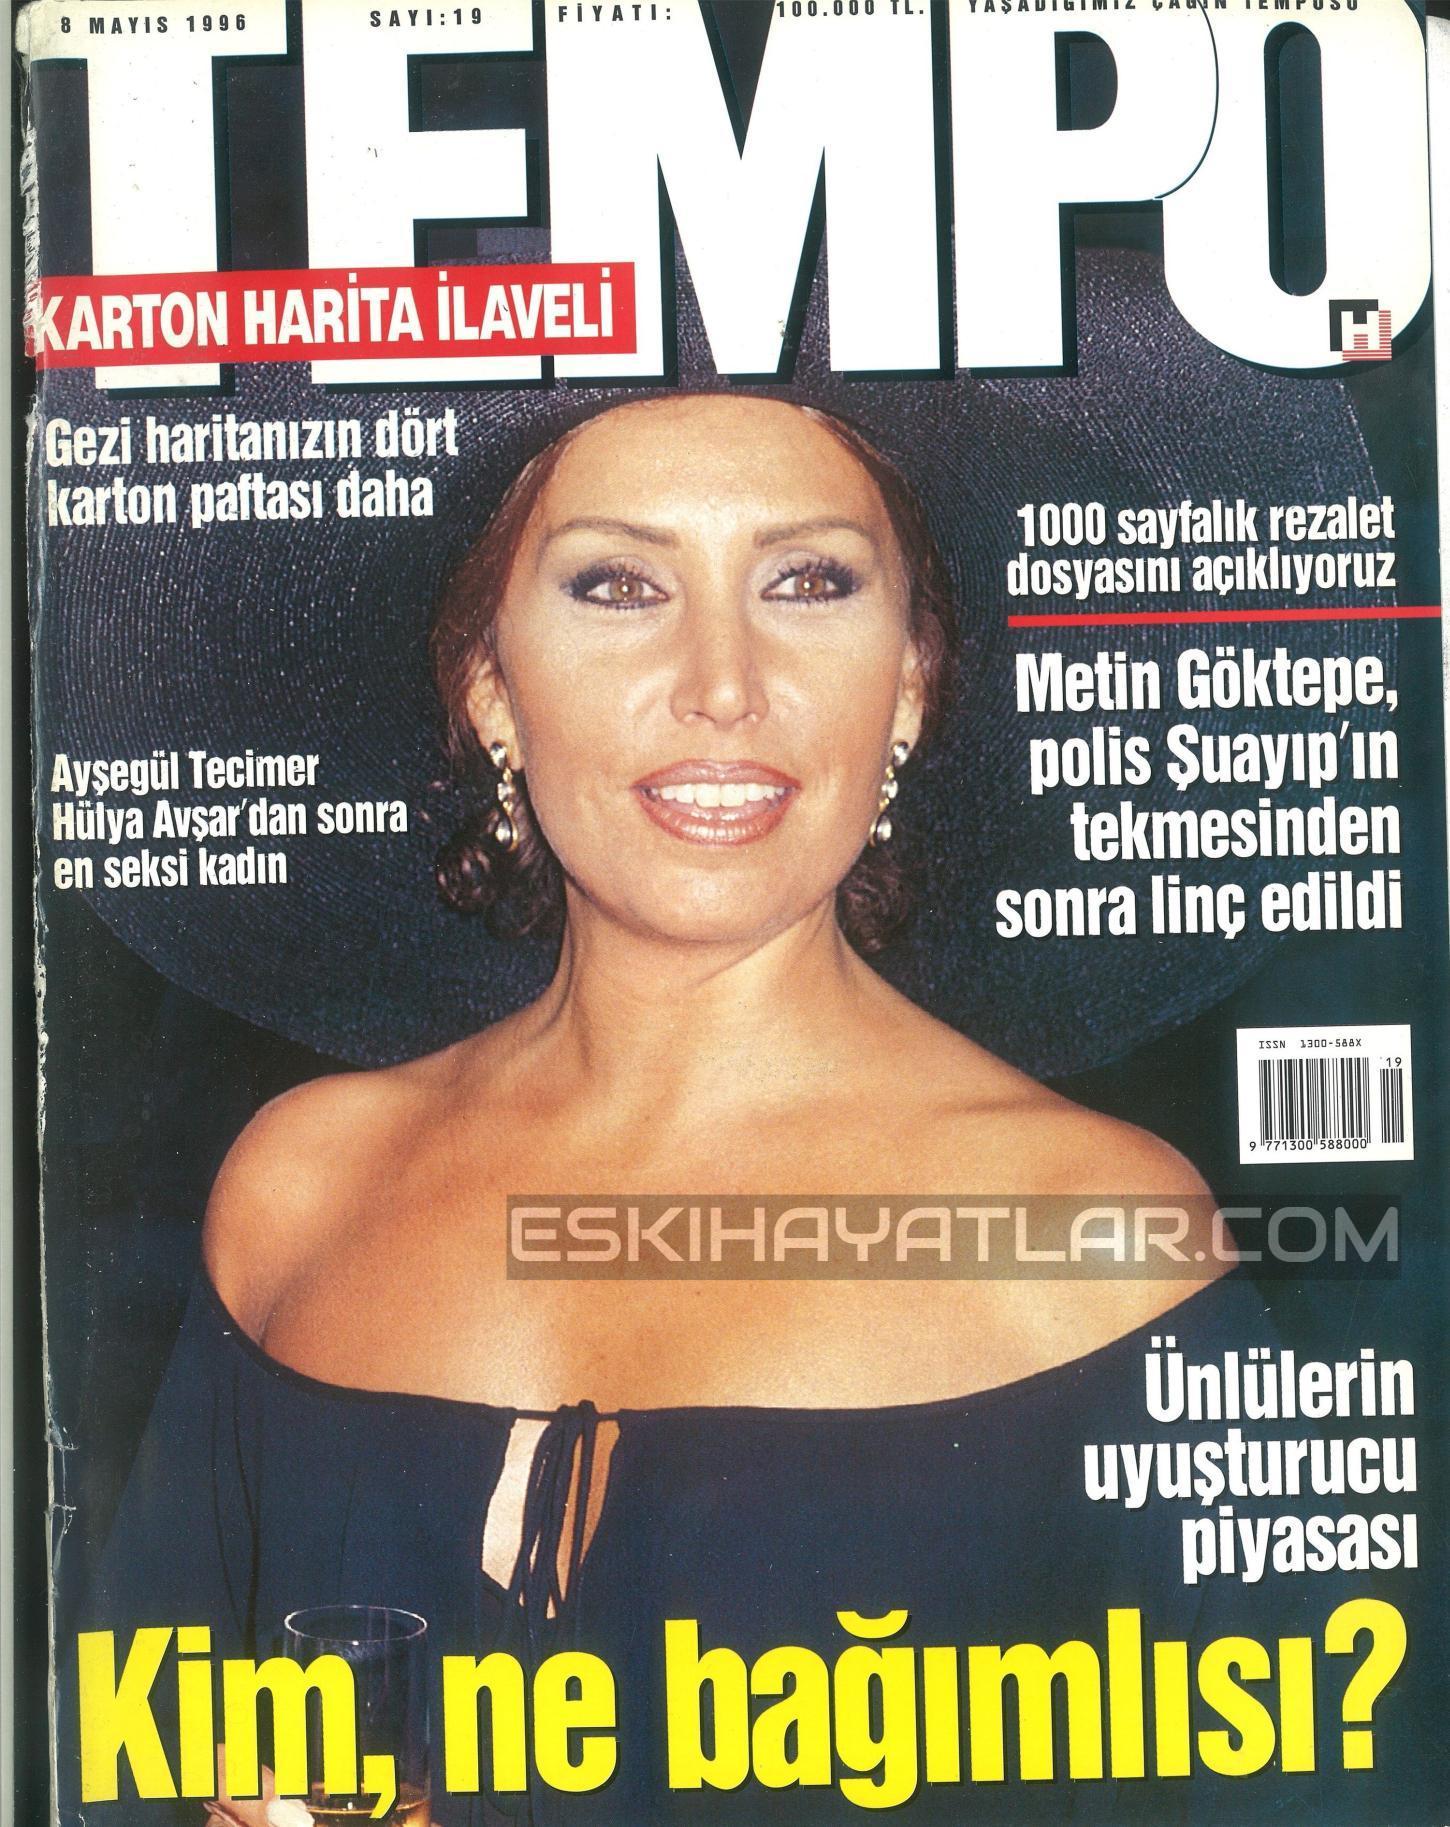 sedat-peker-ben-babalar-ustuyum-1996-tempo-dergisi-roportaji (3)